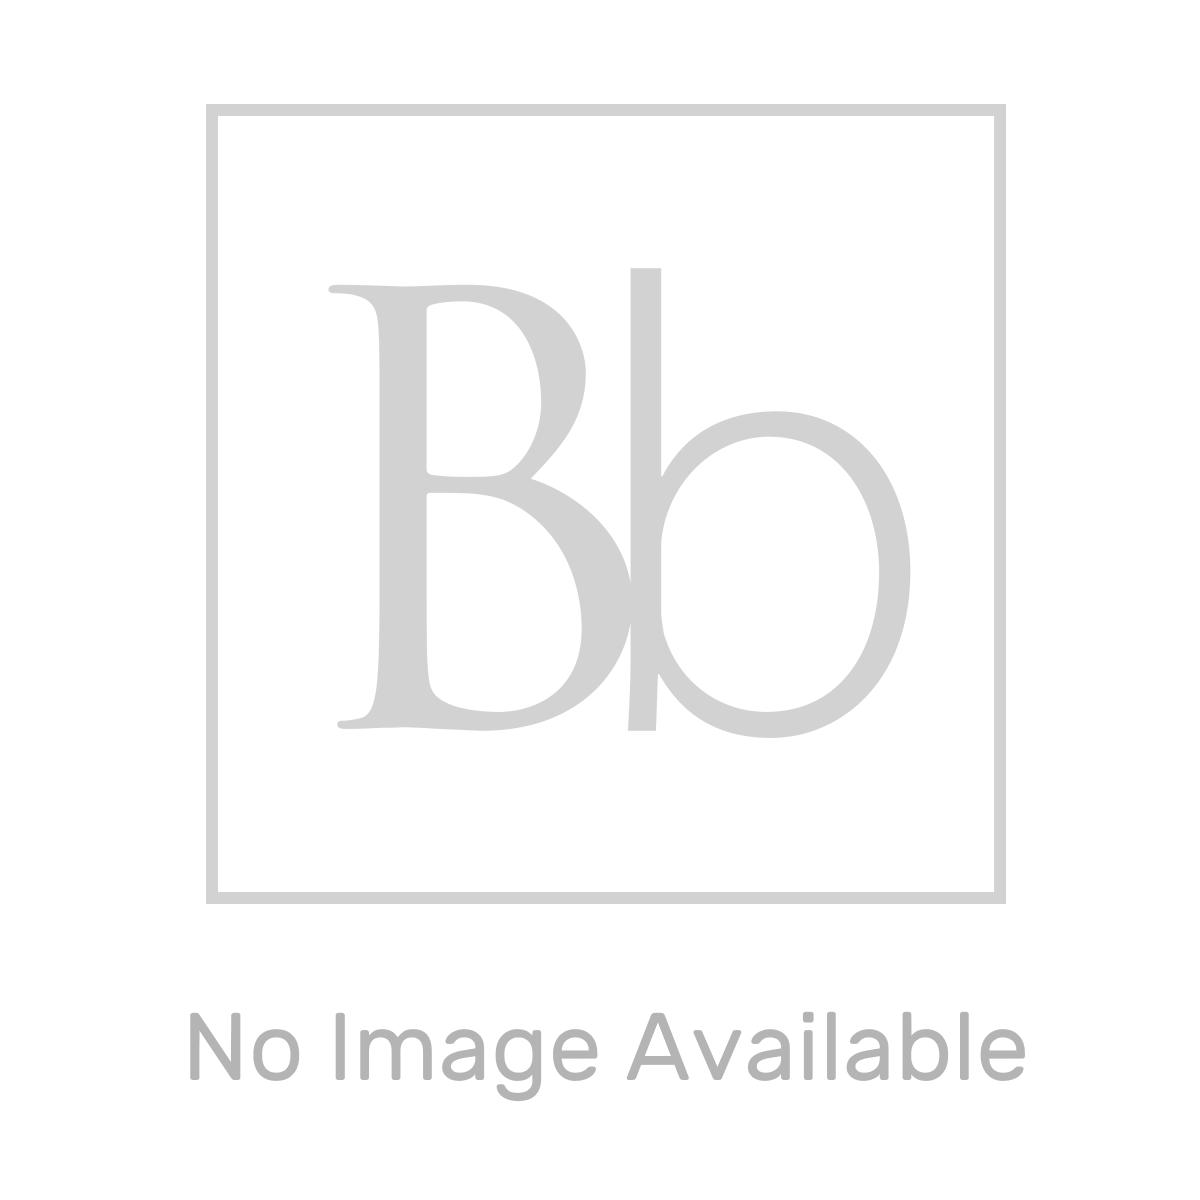 RAK Washington Grey Bathroom Mirror 800mm Measurements